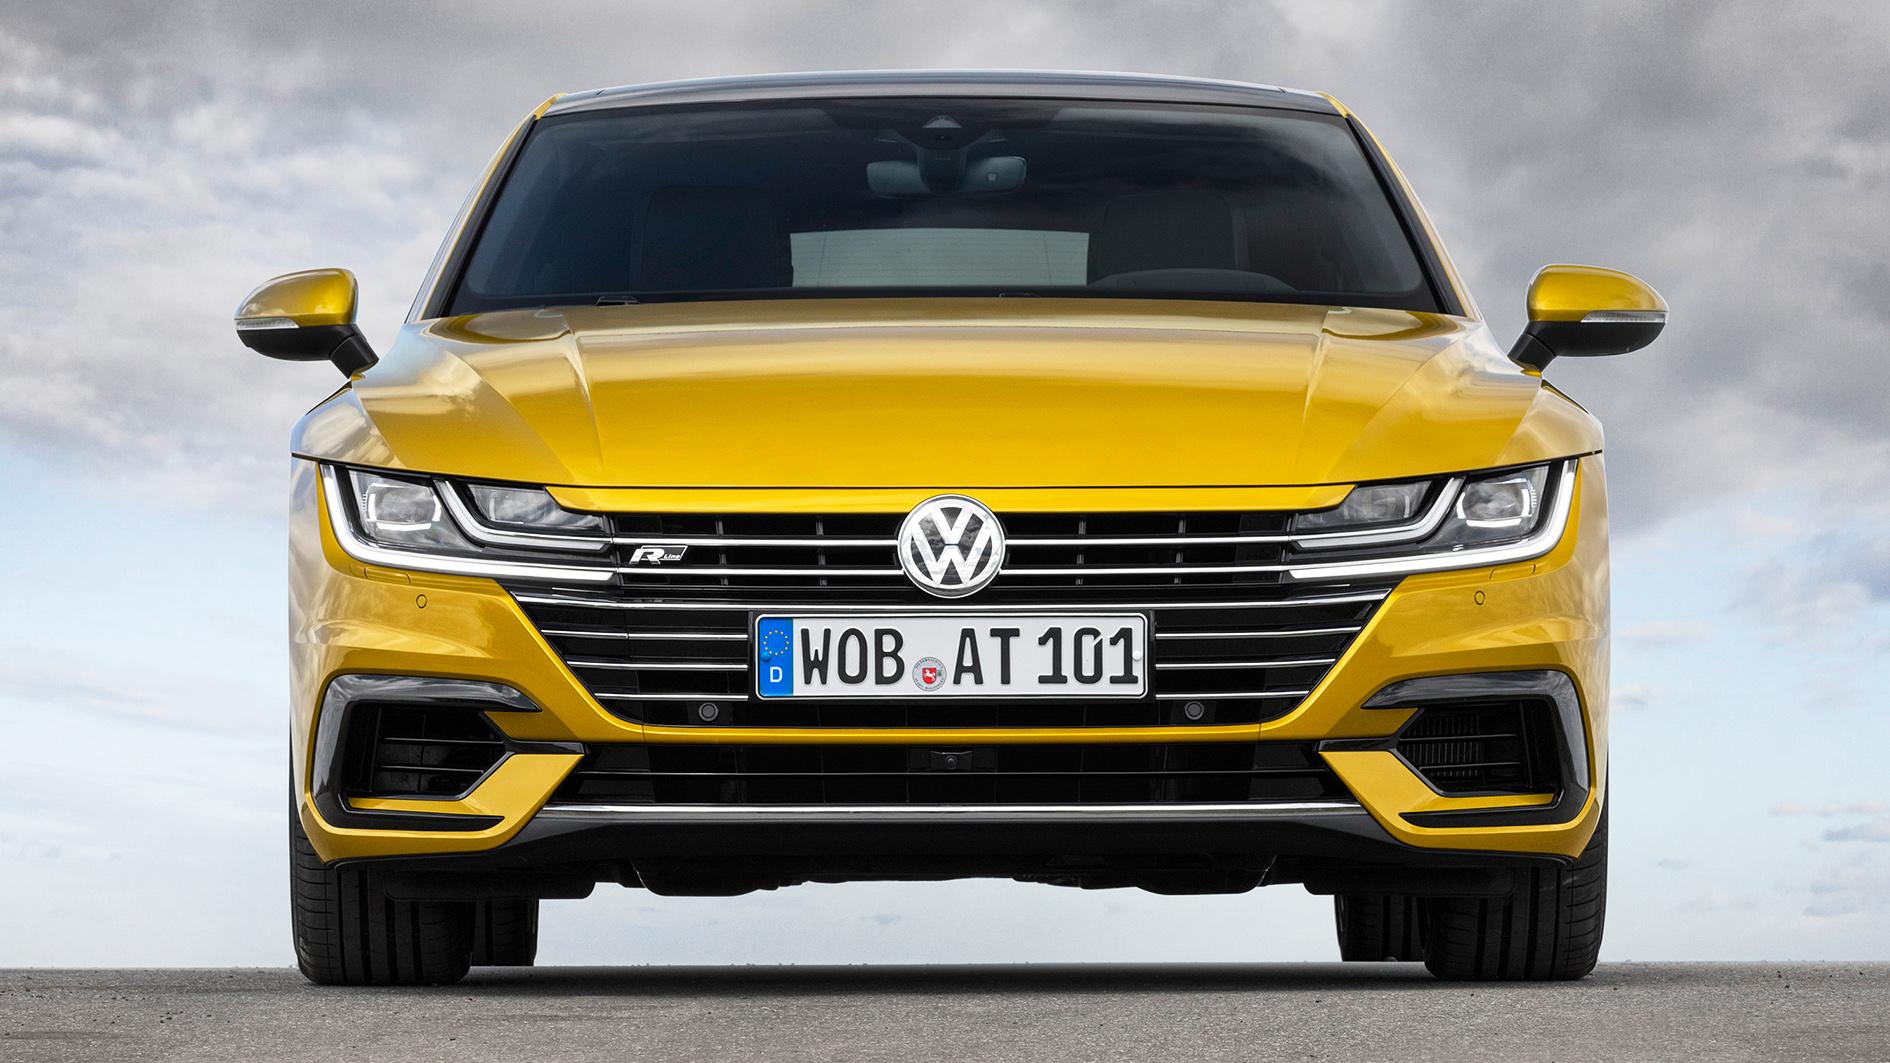 Volkswagen Arteon 2 0 Tdi 4motion R Line